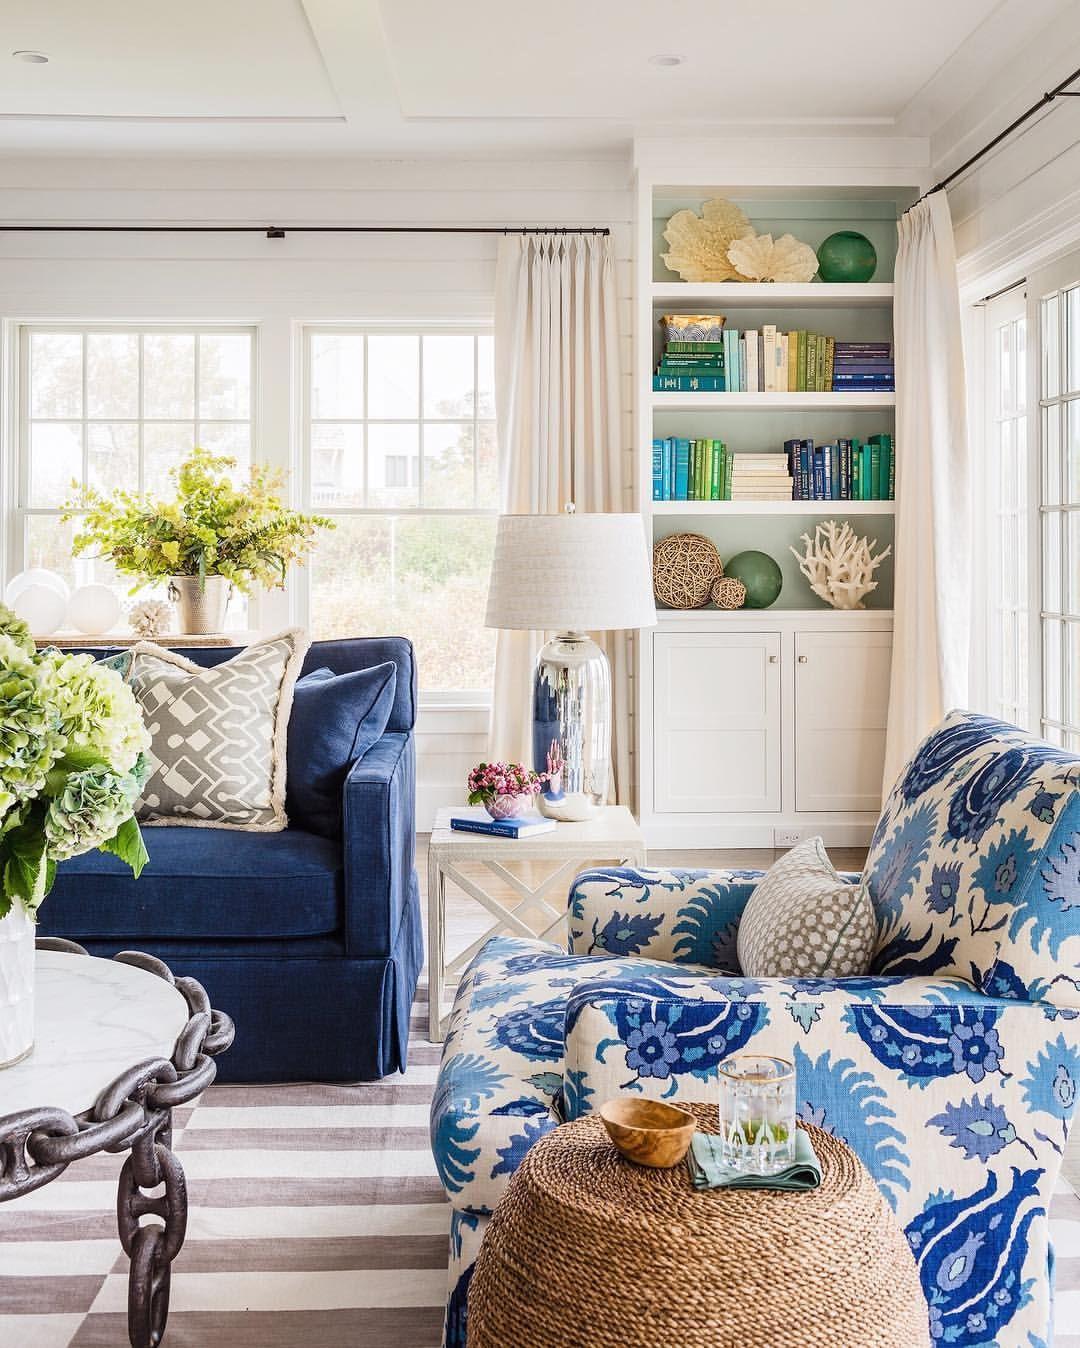 Cape Cod summer vibes 💙#tharonandersondesign | Living room ...